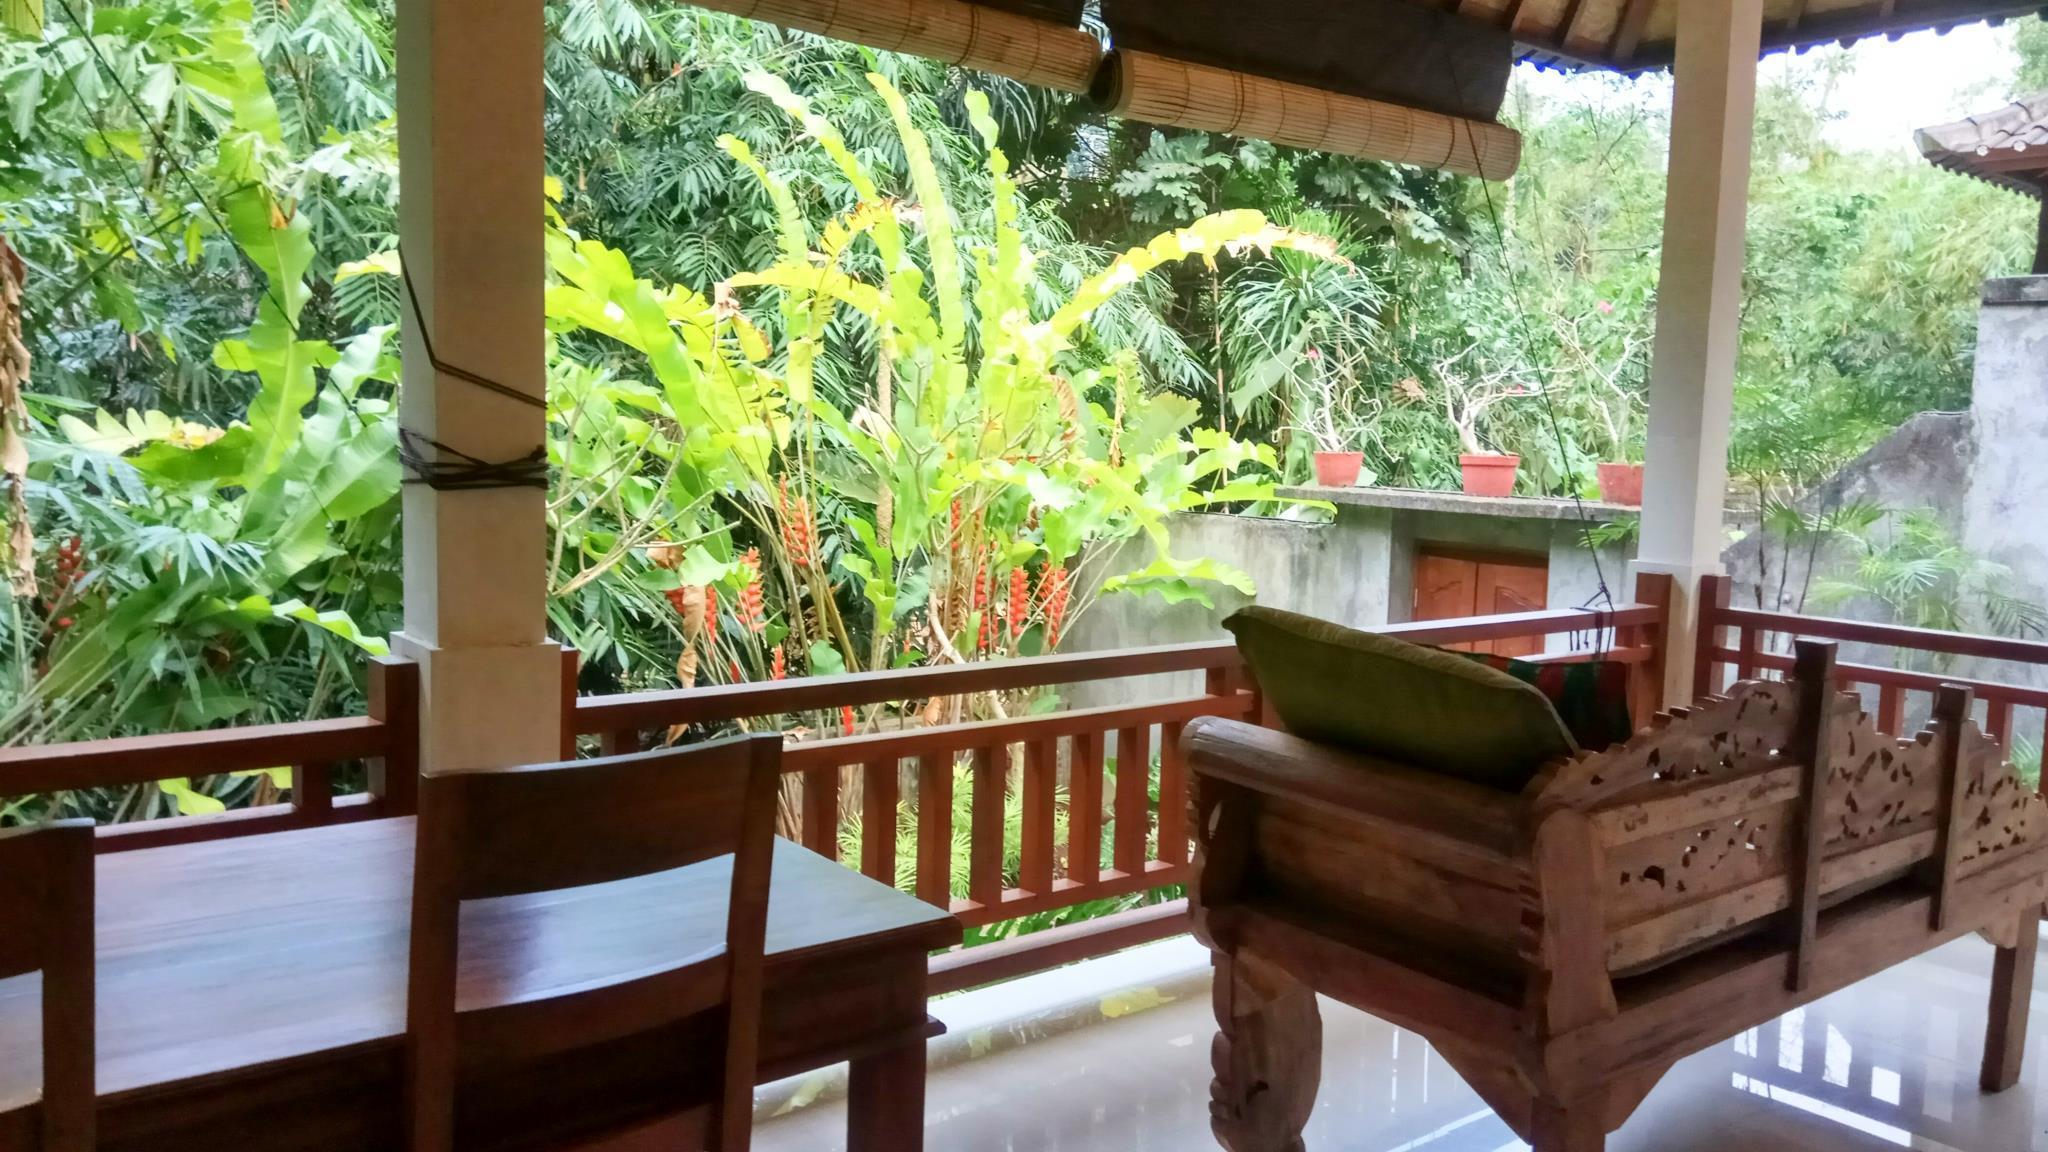 Hotel 1 Bedroom Villa With Private Garden - Banjar Penestanan Kaja - Cahya House